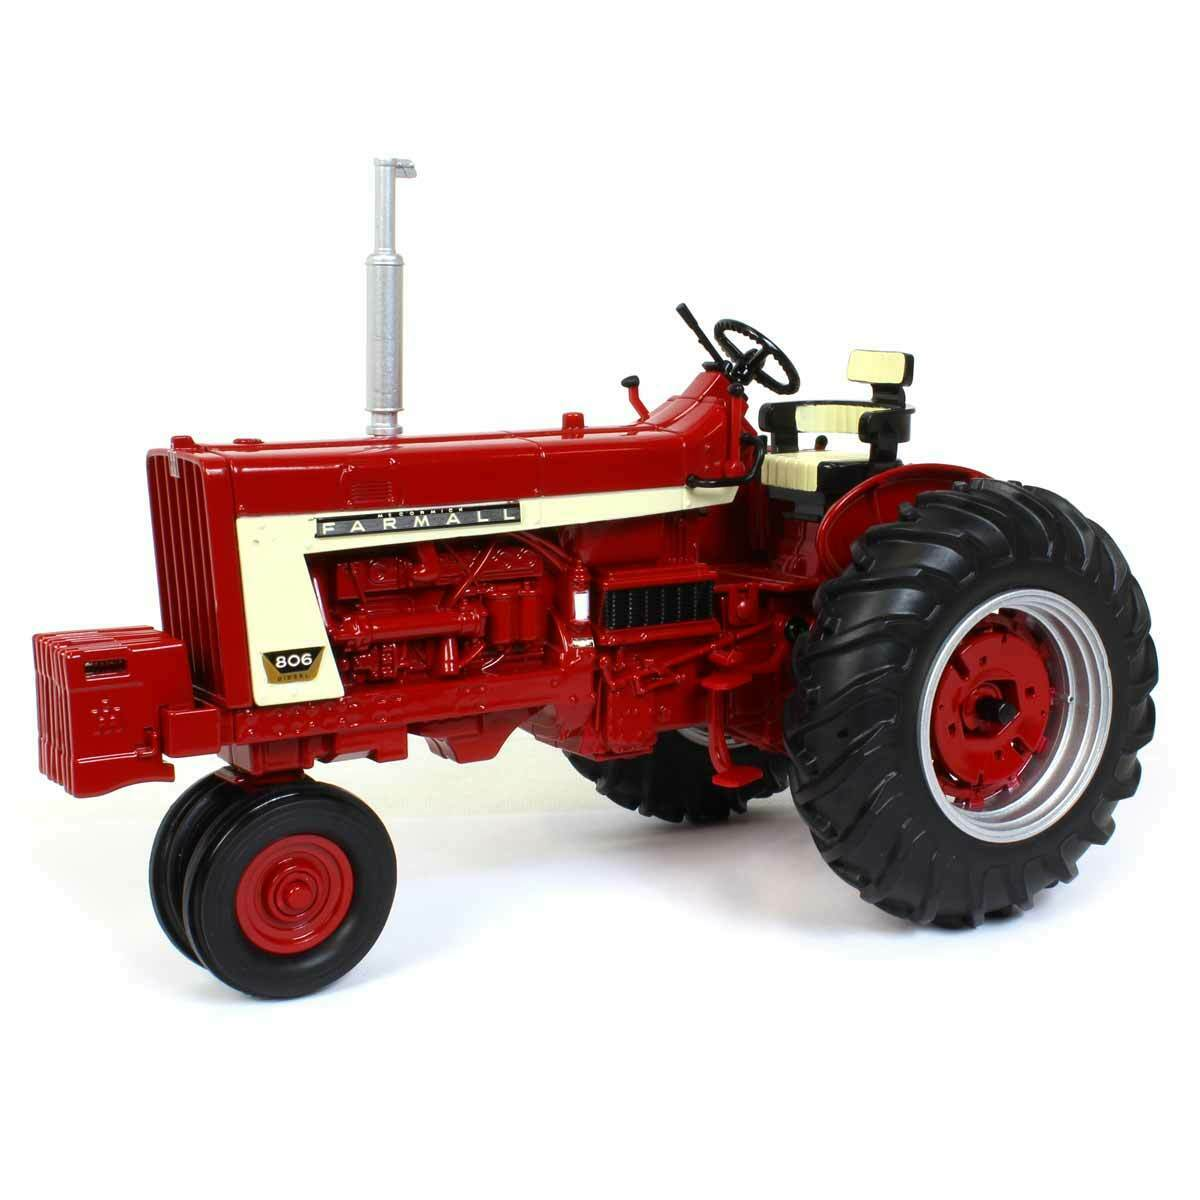 1 16 Prestige Series International Harvester Farmall 806 Narrow NIB ERTL 44190